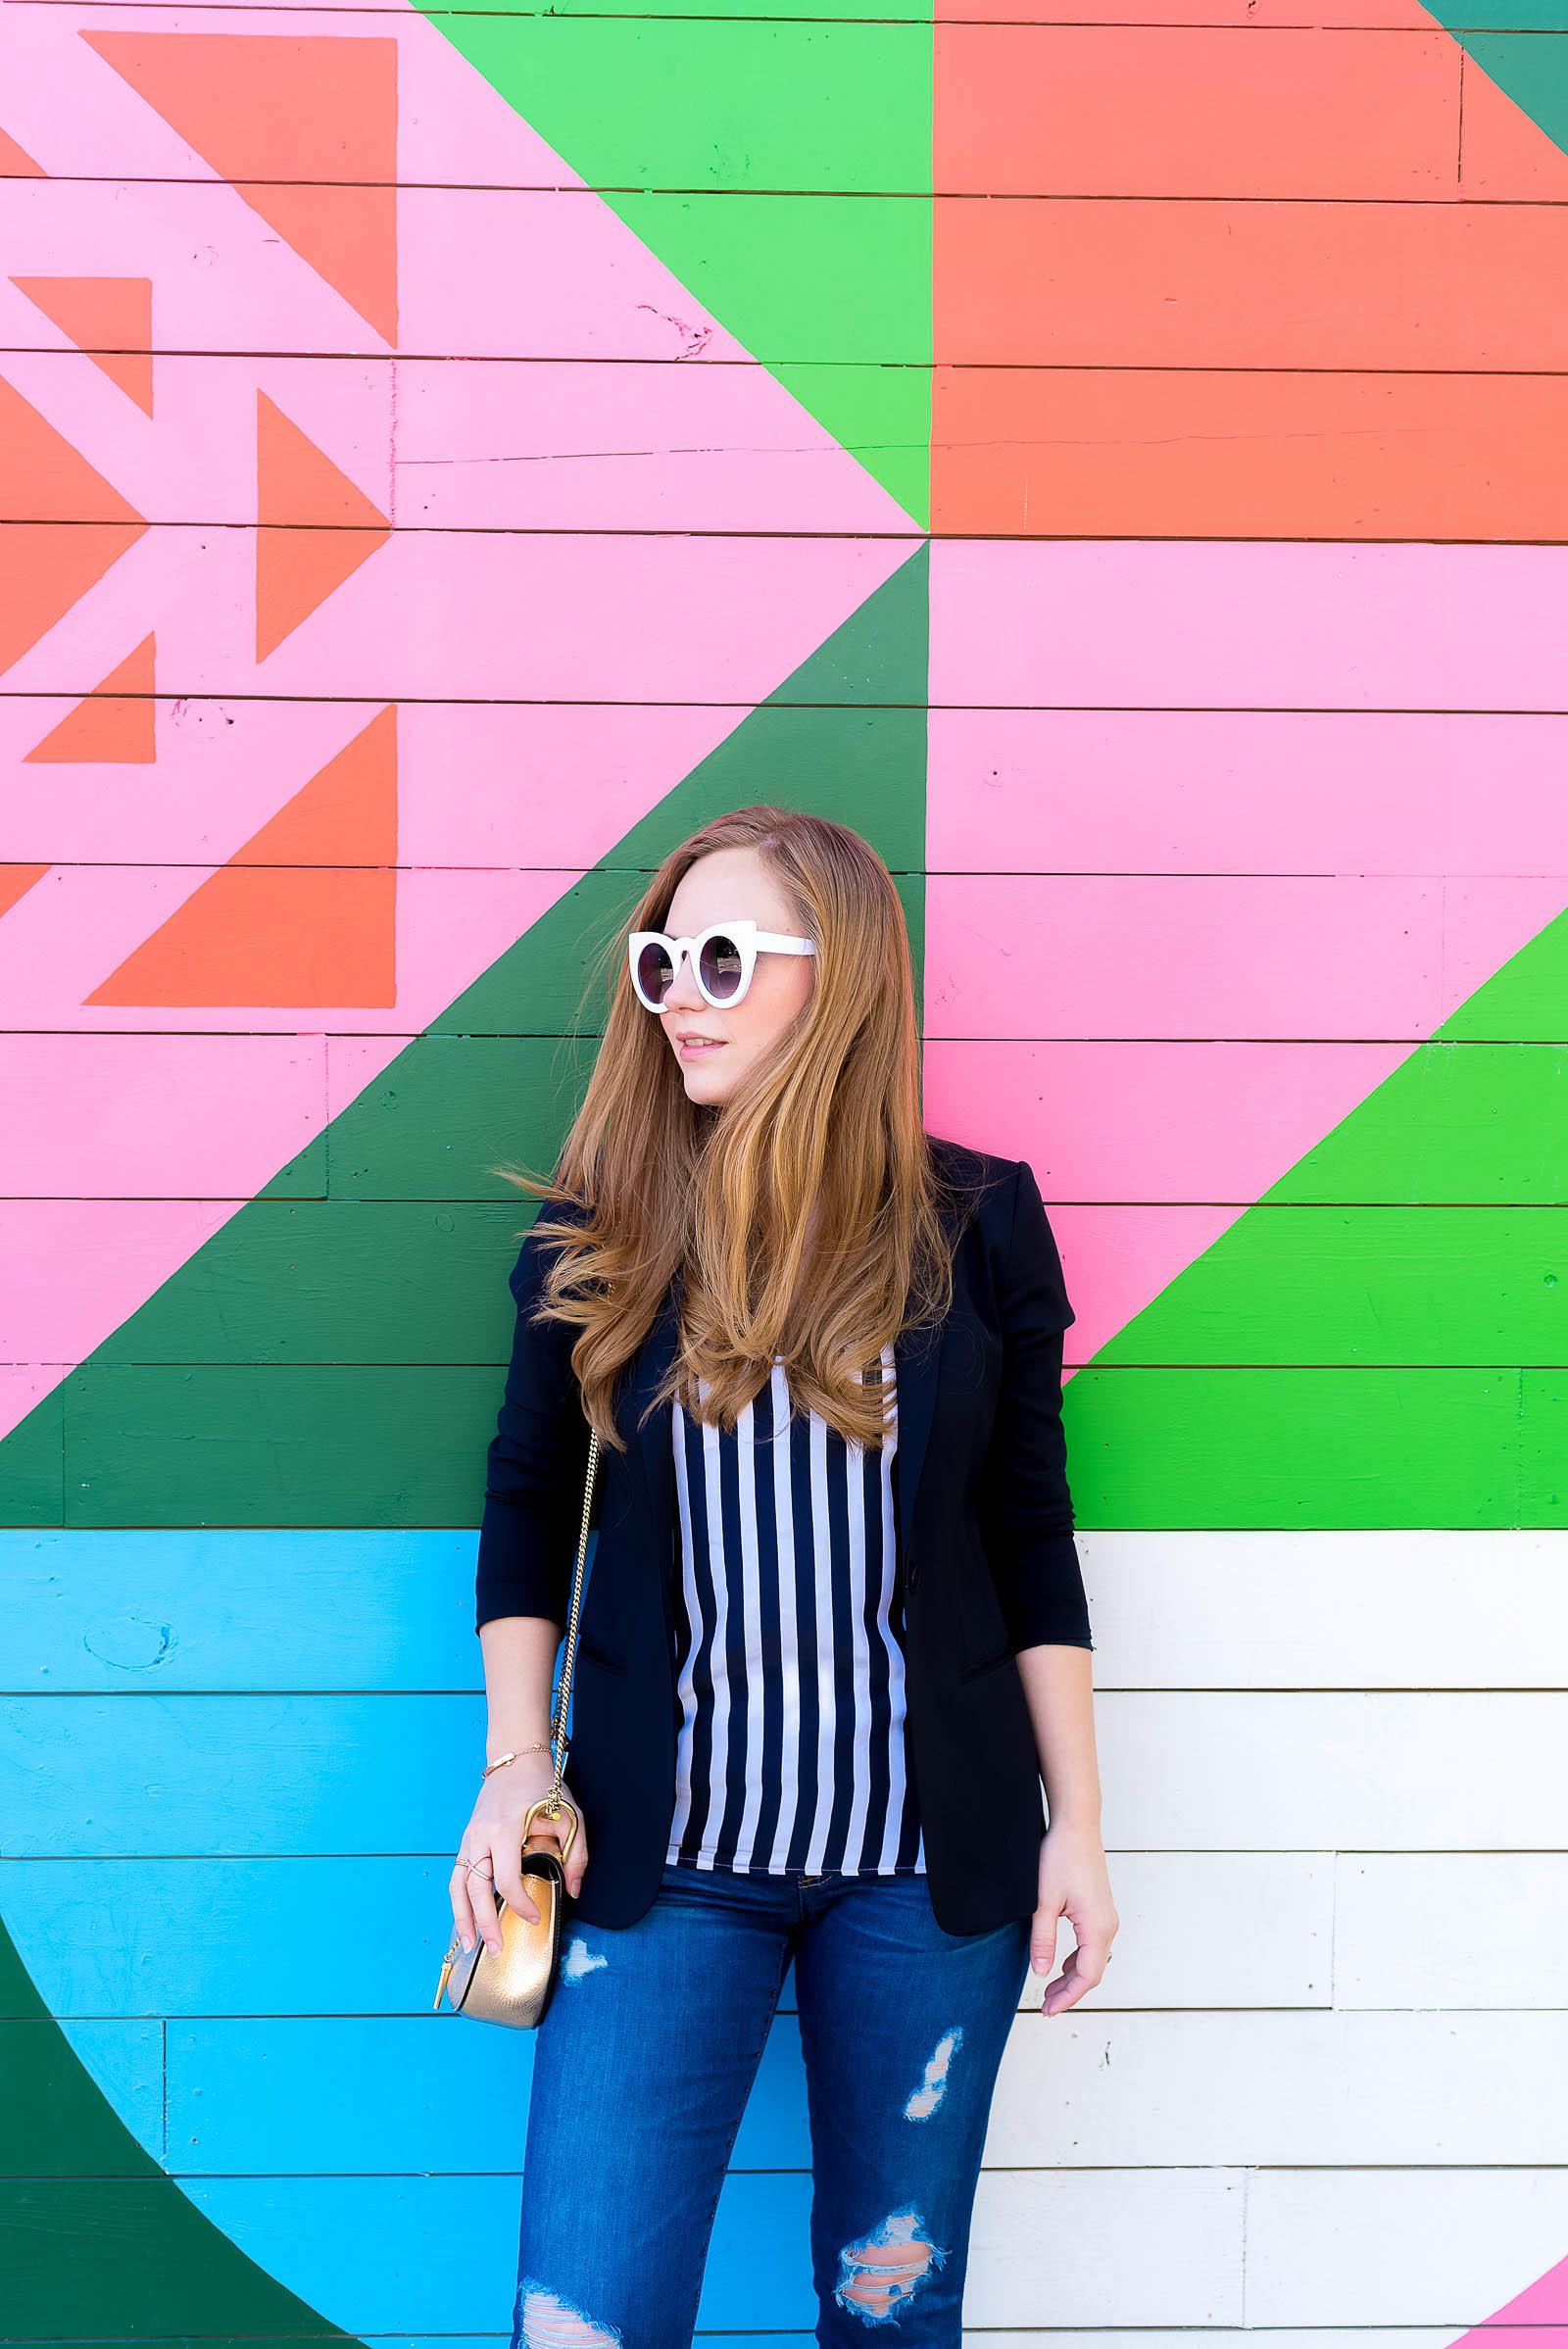 AG Legging Jeans Chloe Drew Bag Striped Outfit